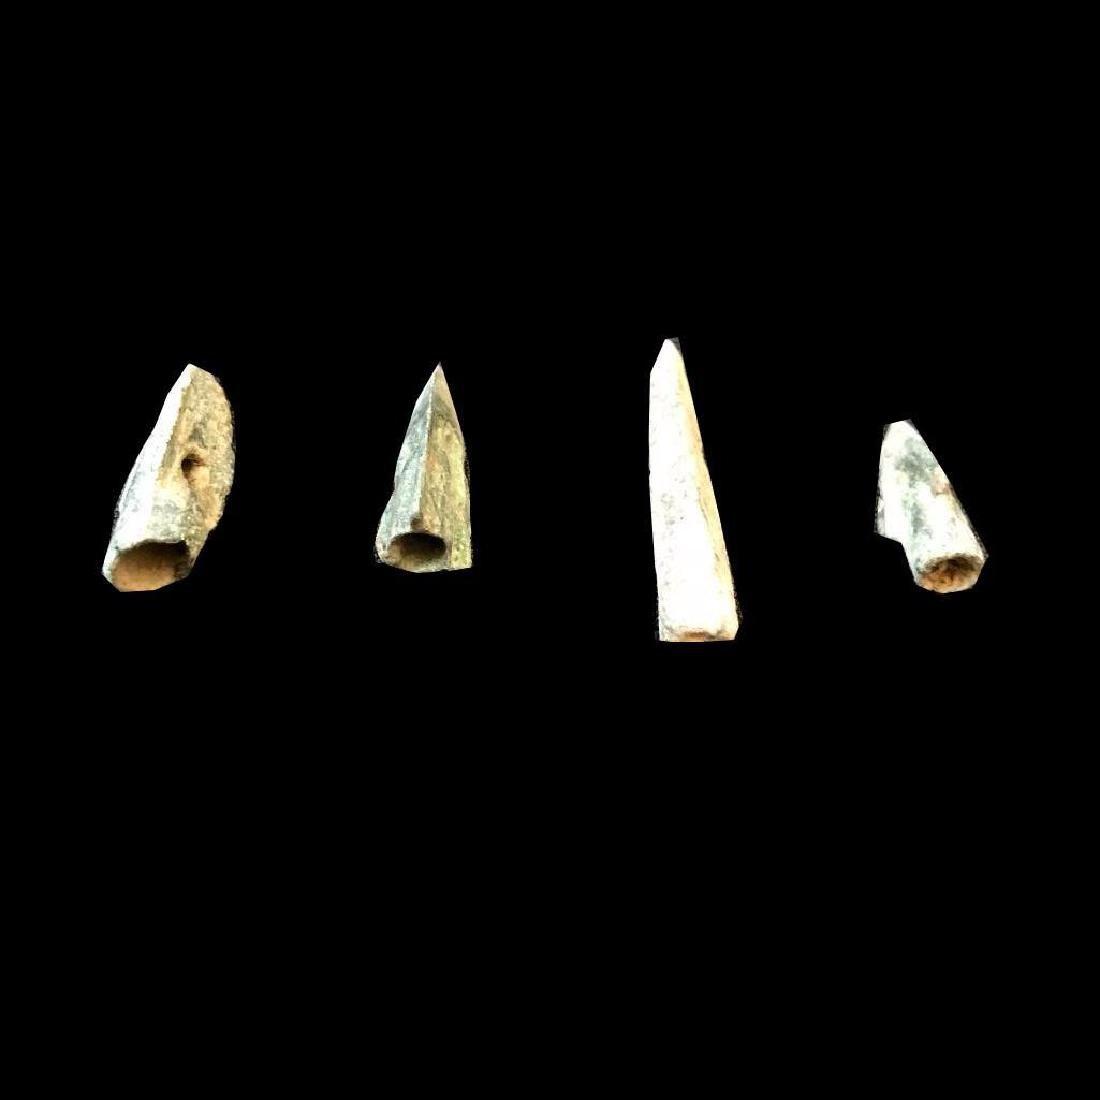 4thc B.C. Ancient Greek Punic Arrowheads - 2